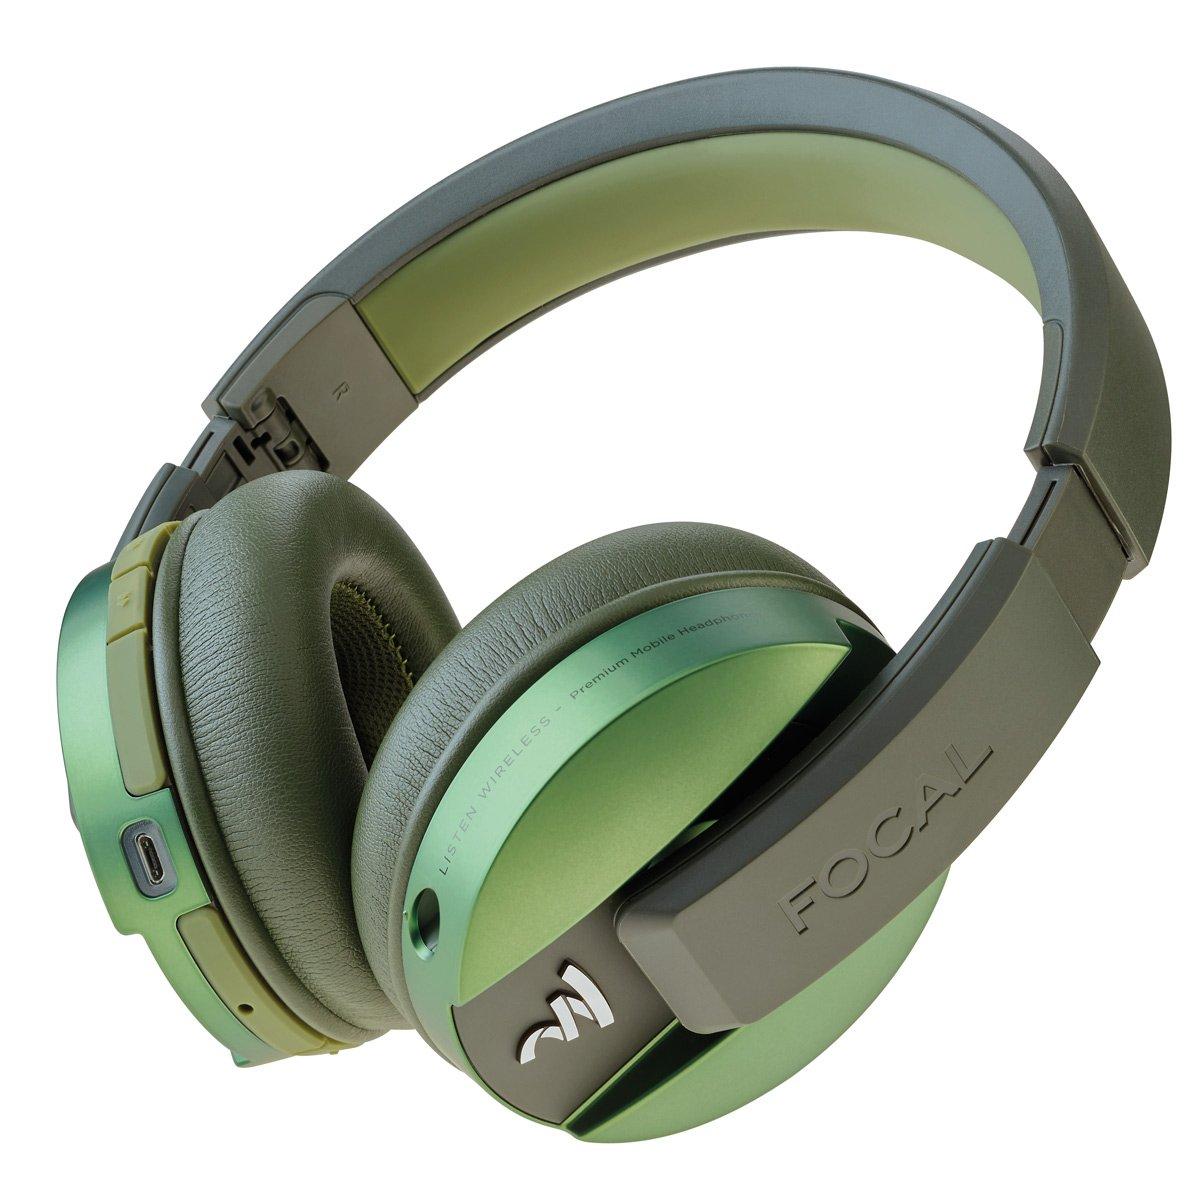 32c72c40670 Amazon.com: Focal Listen Wireless Over-Ear Headphones with Microphone  (Green): Home Audio & Theater